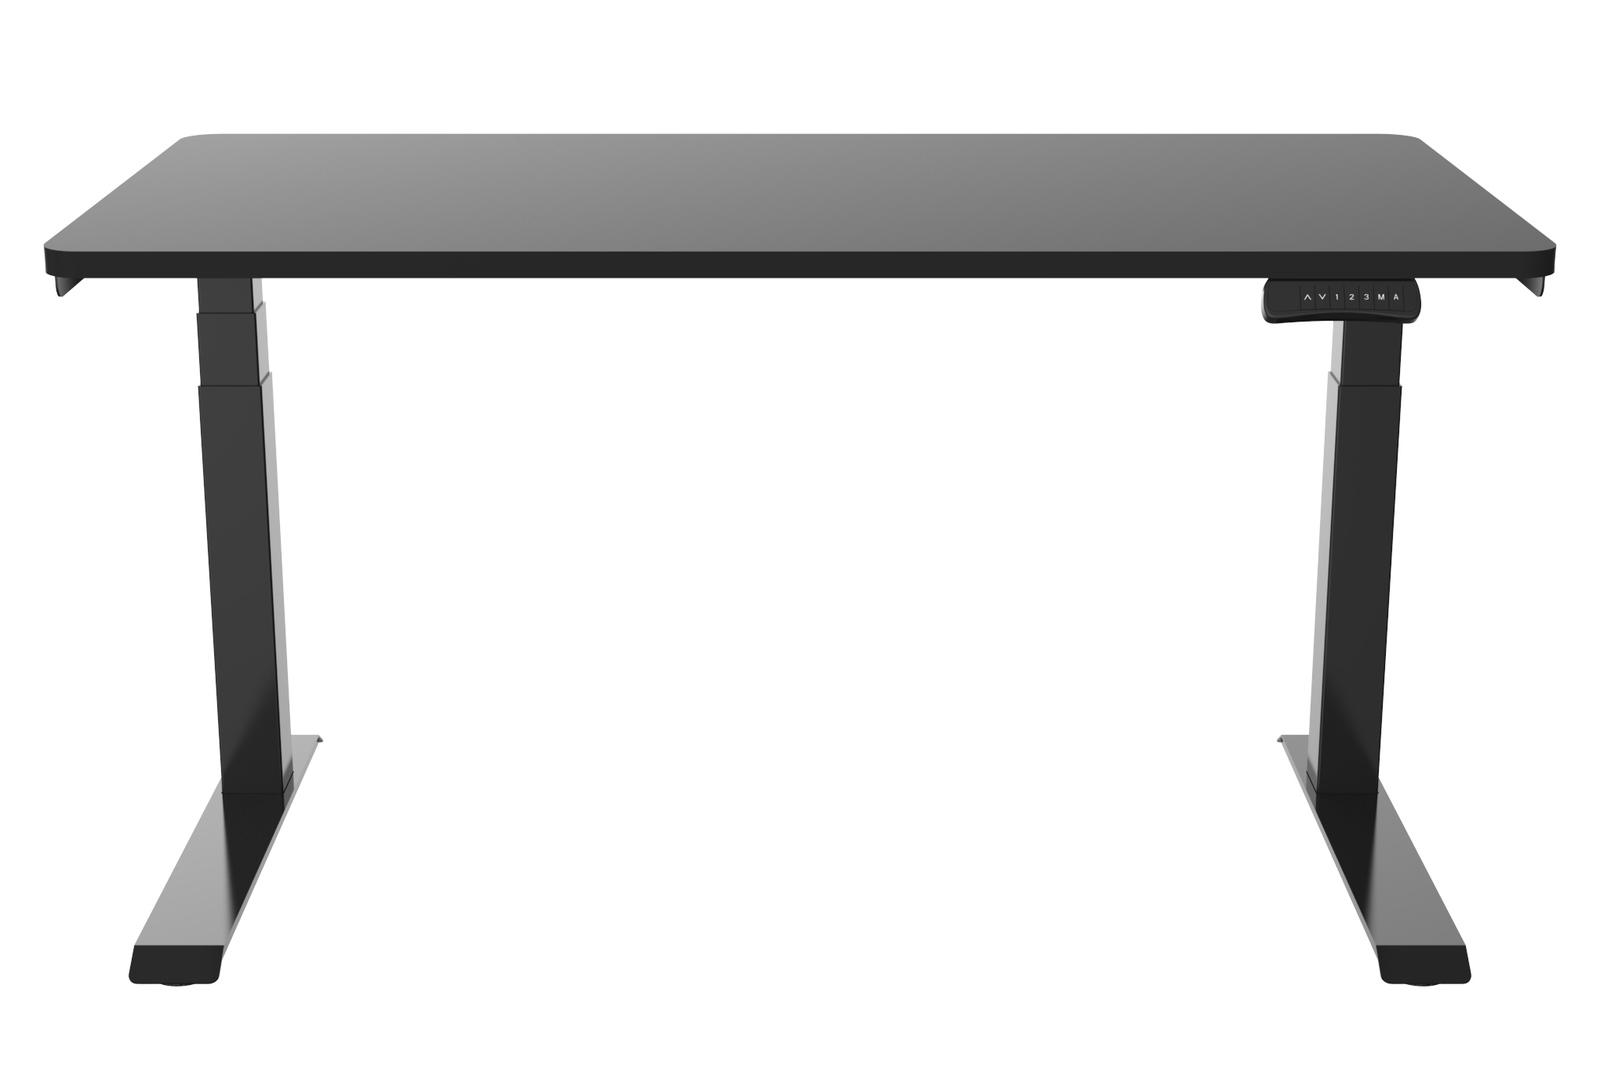 Gorilla Office: 3-Stage Motorised Height Adjustable Desk - Black/Black (1400 x 700mm) image